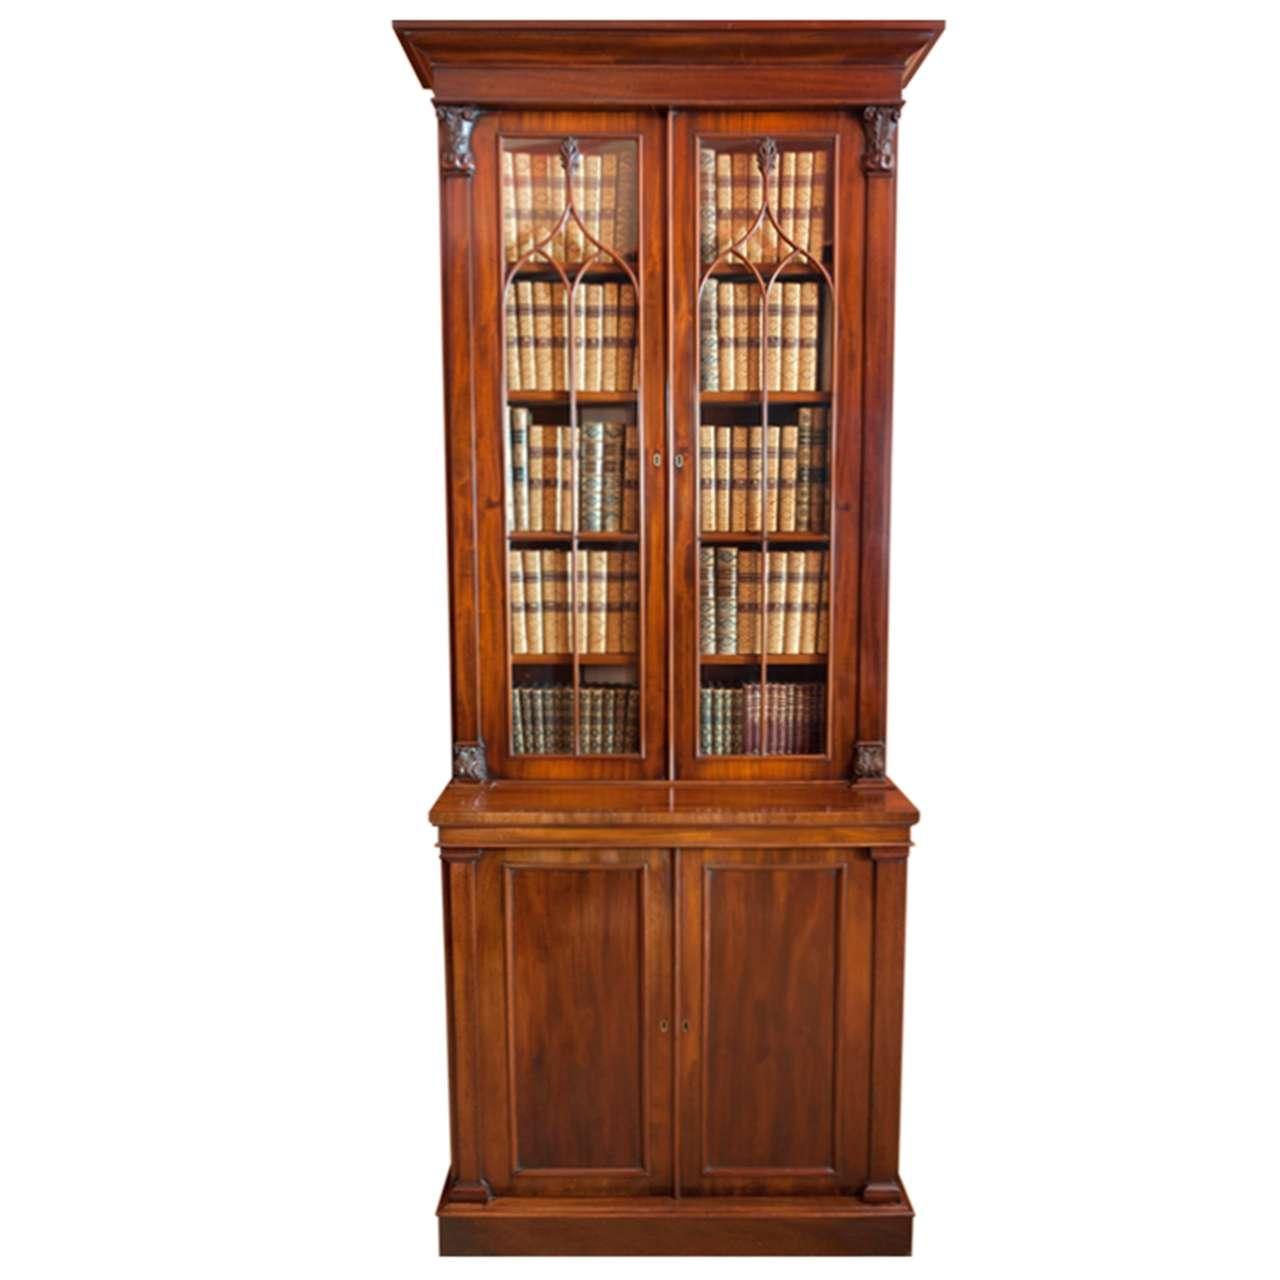 A fine William IV period tall mahogany and glazed door Bookcase